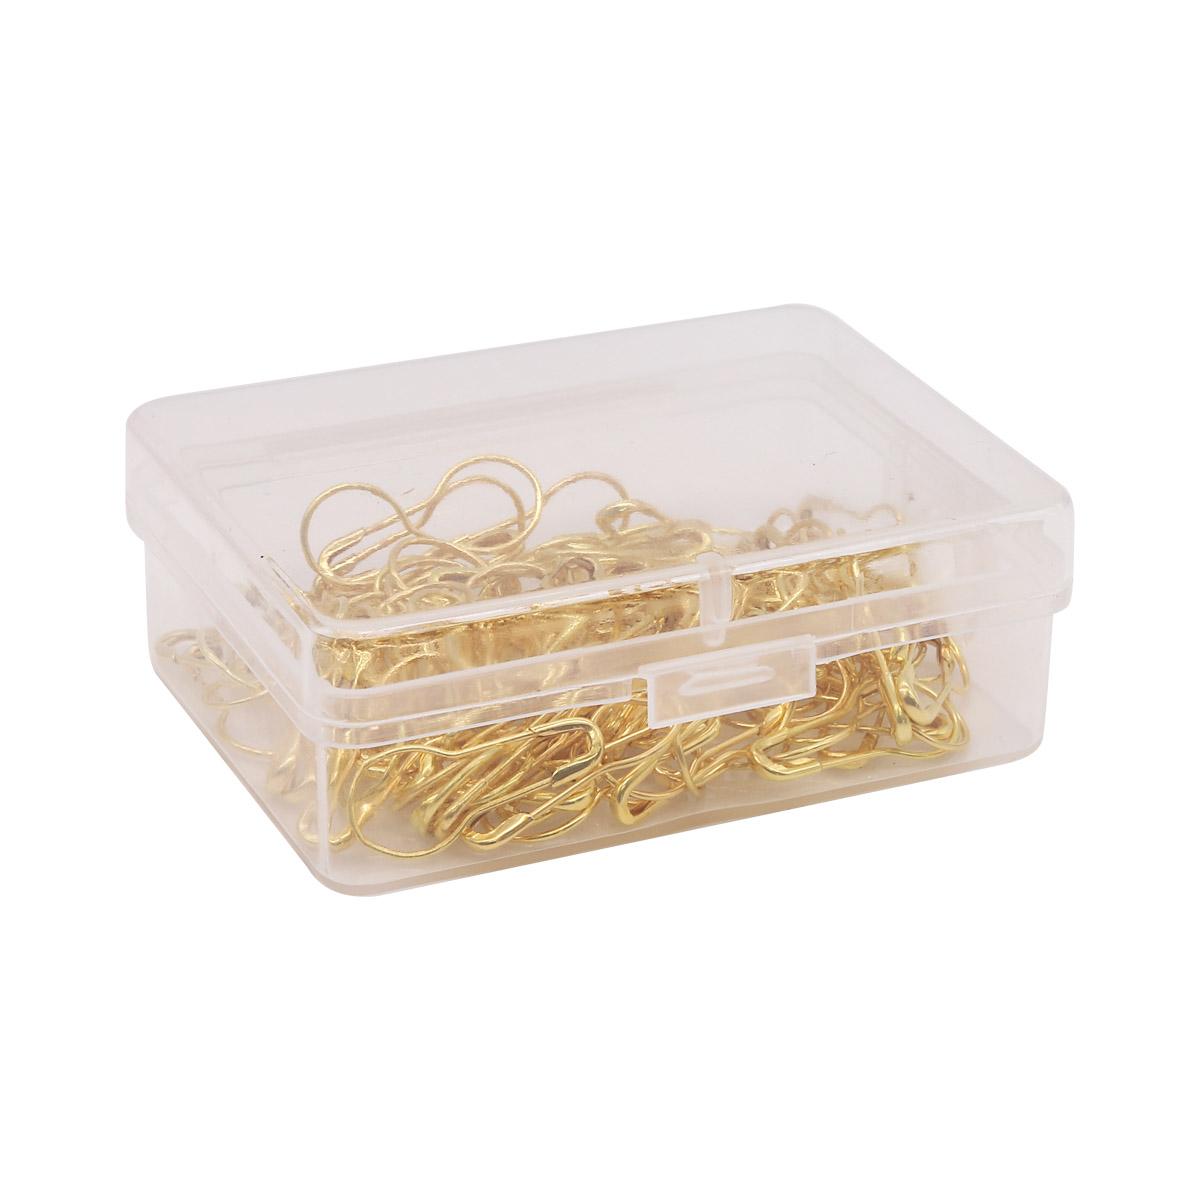 AC006 Булавки для этикеток в футляре, 100шт,золото Hobby&Pro